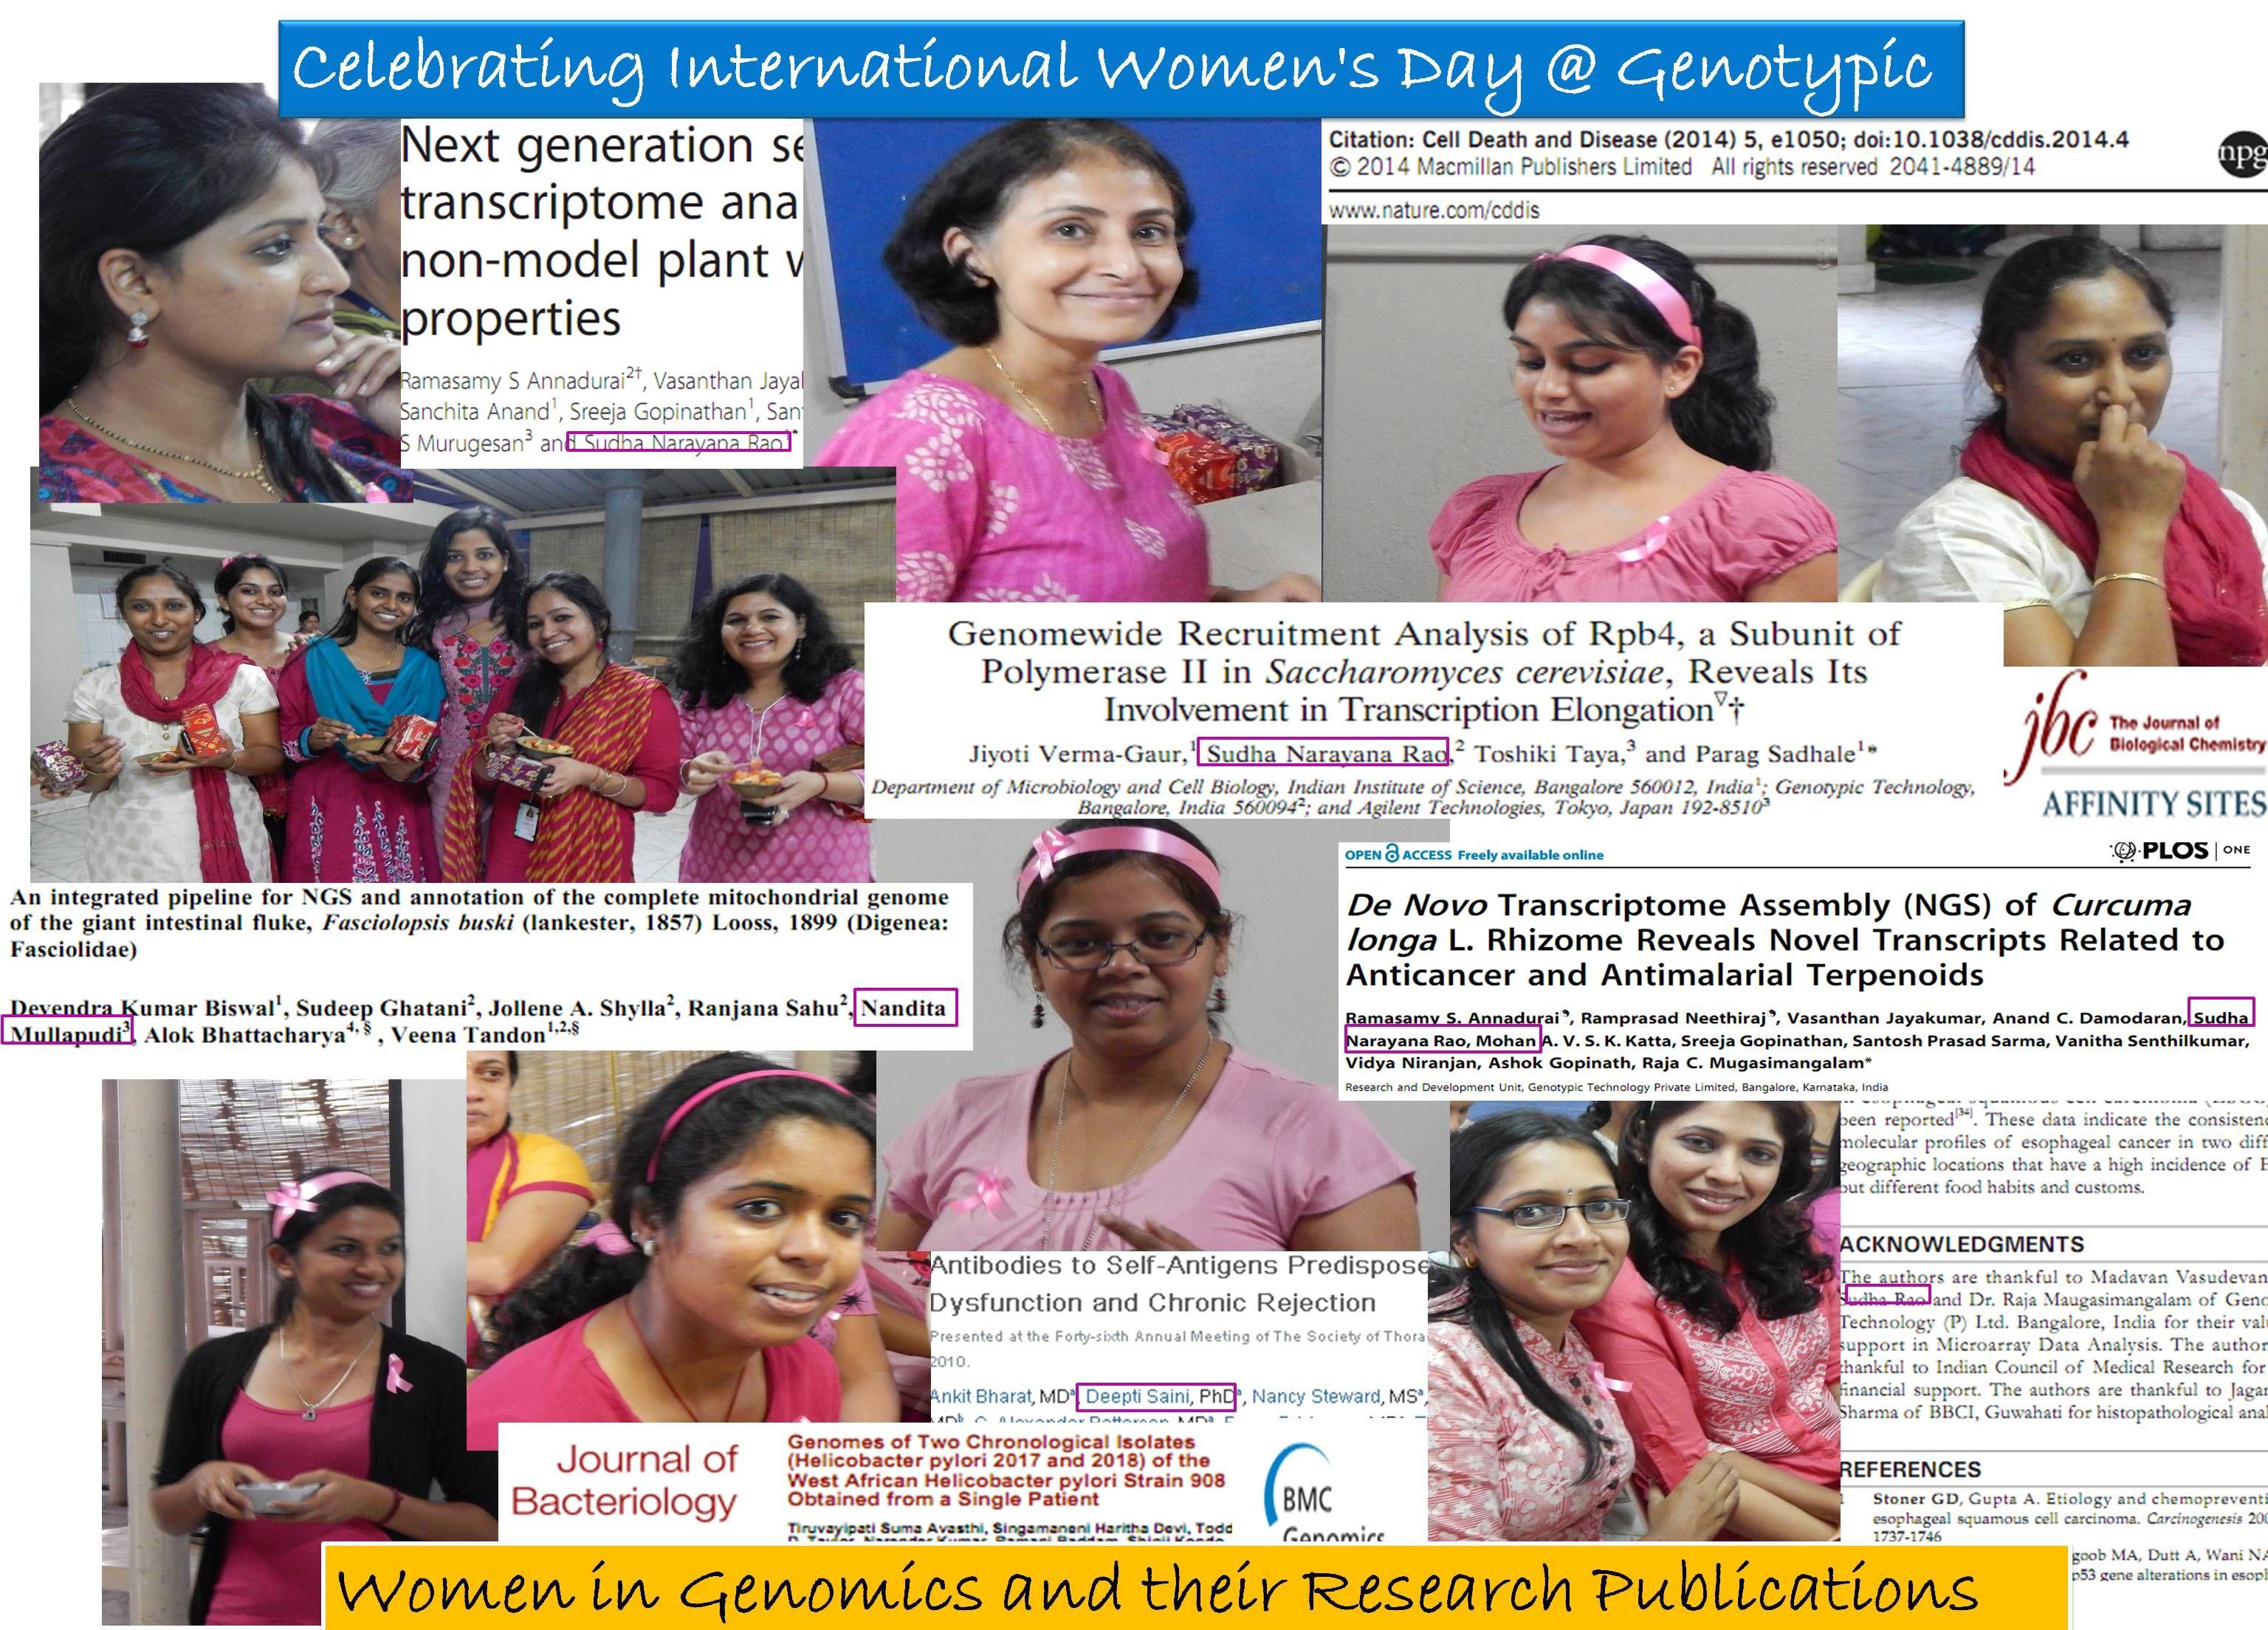 Genotypic celebrates International Women's Day 2014